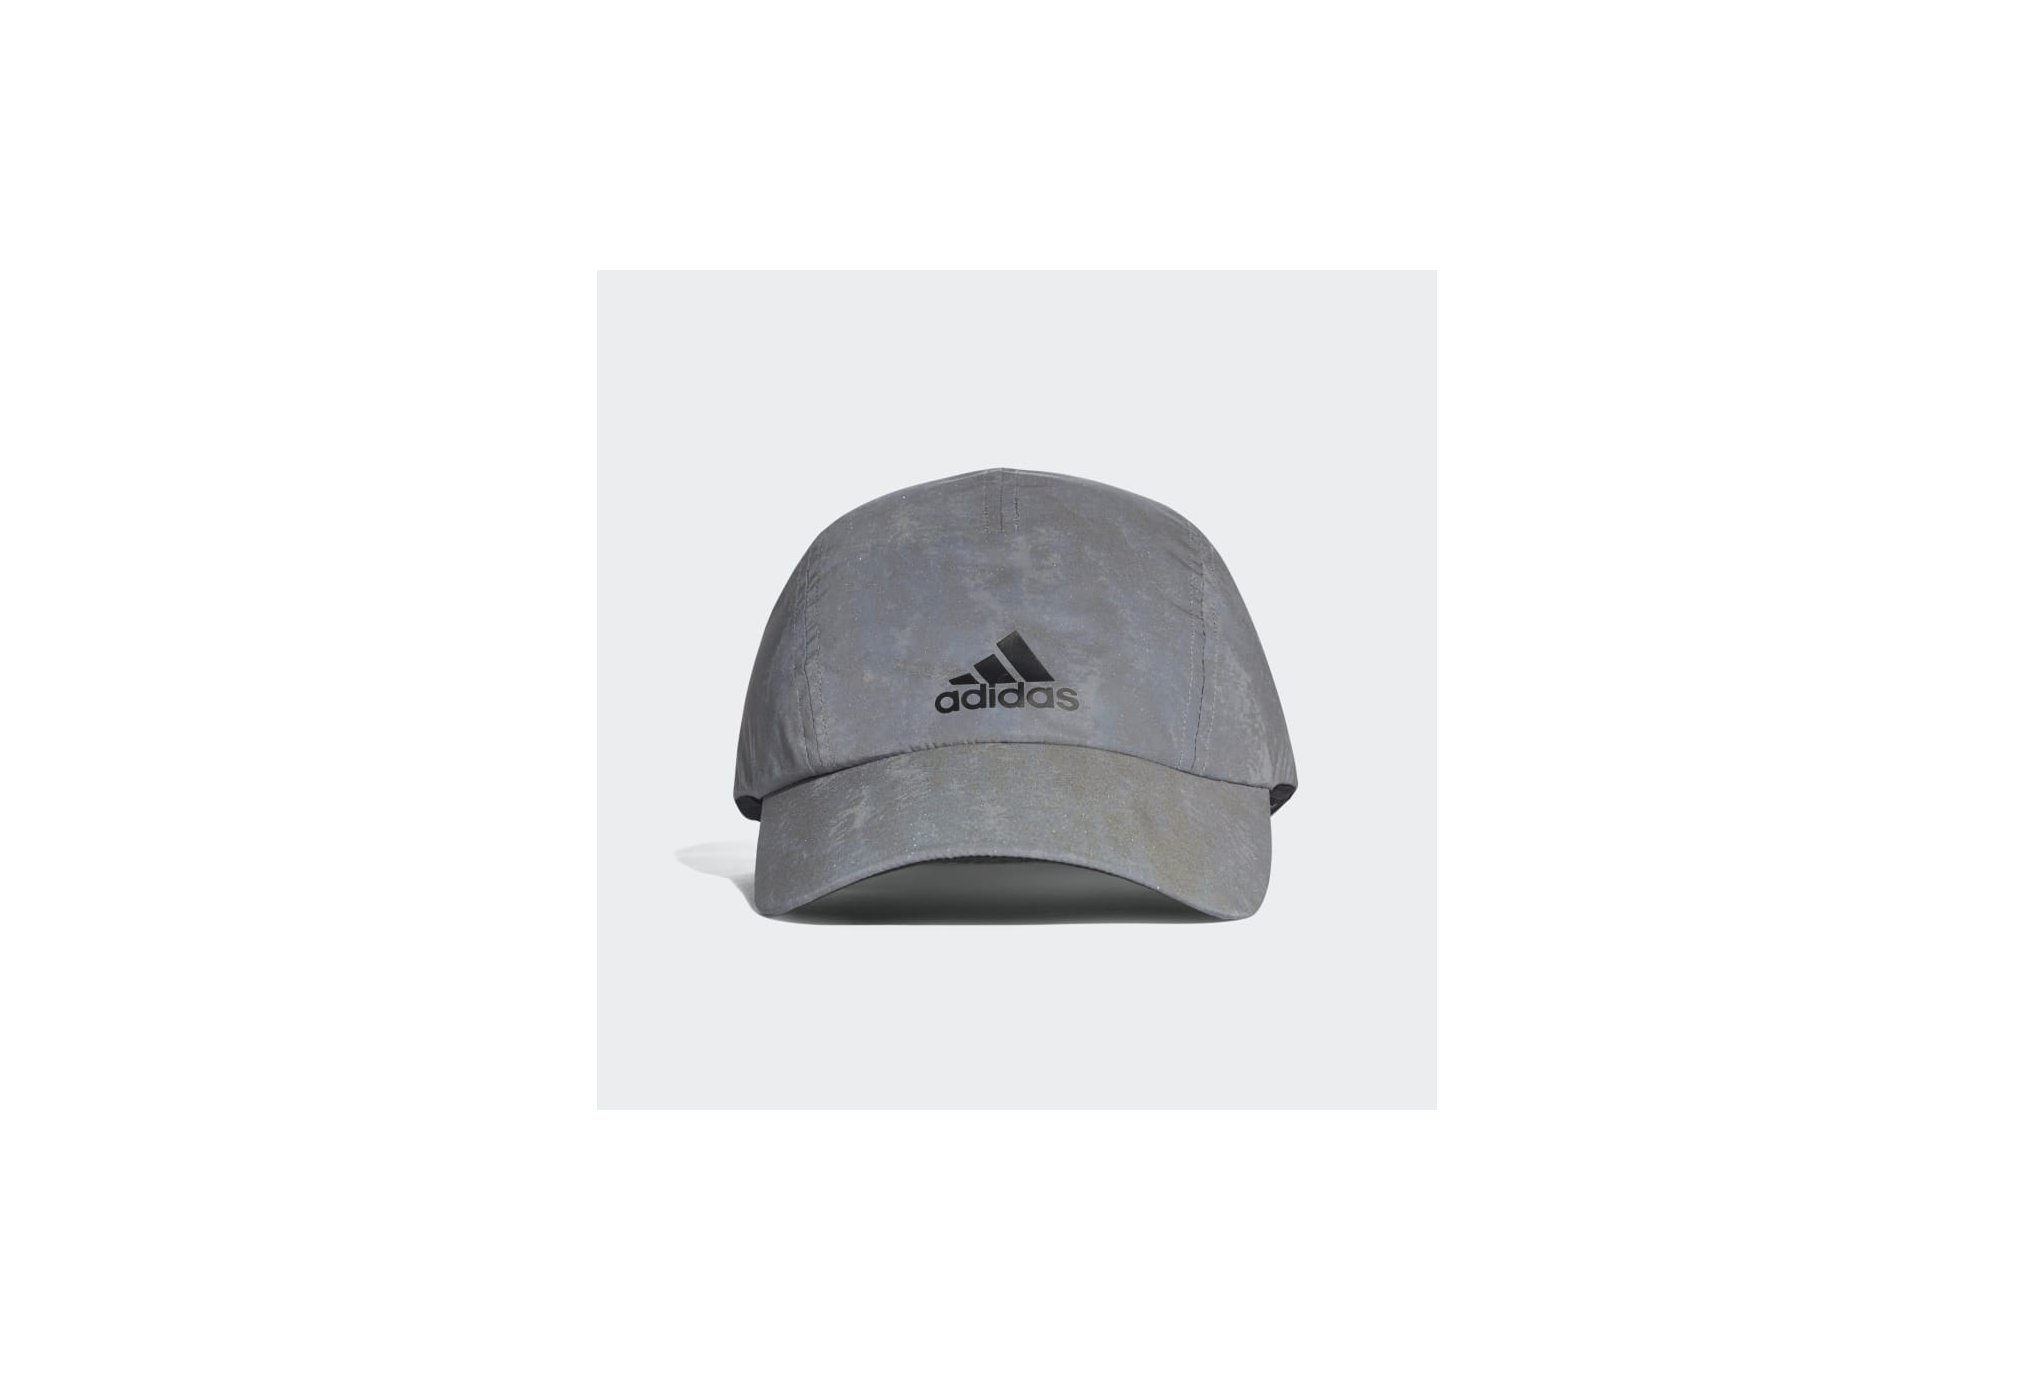 Adidas Run reflective m casquettes / bandeaux